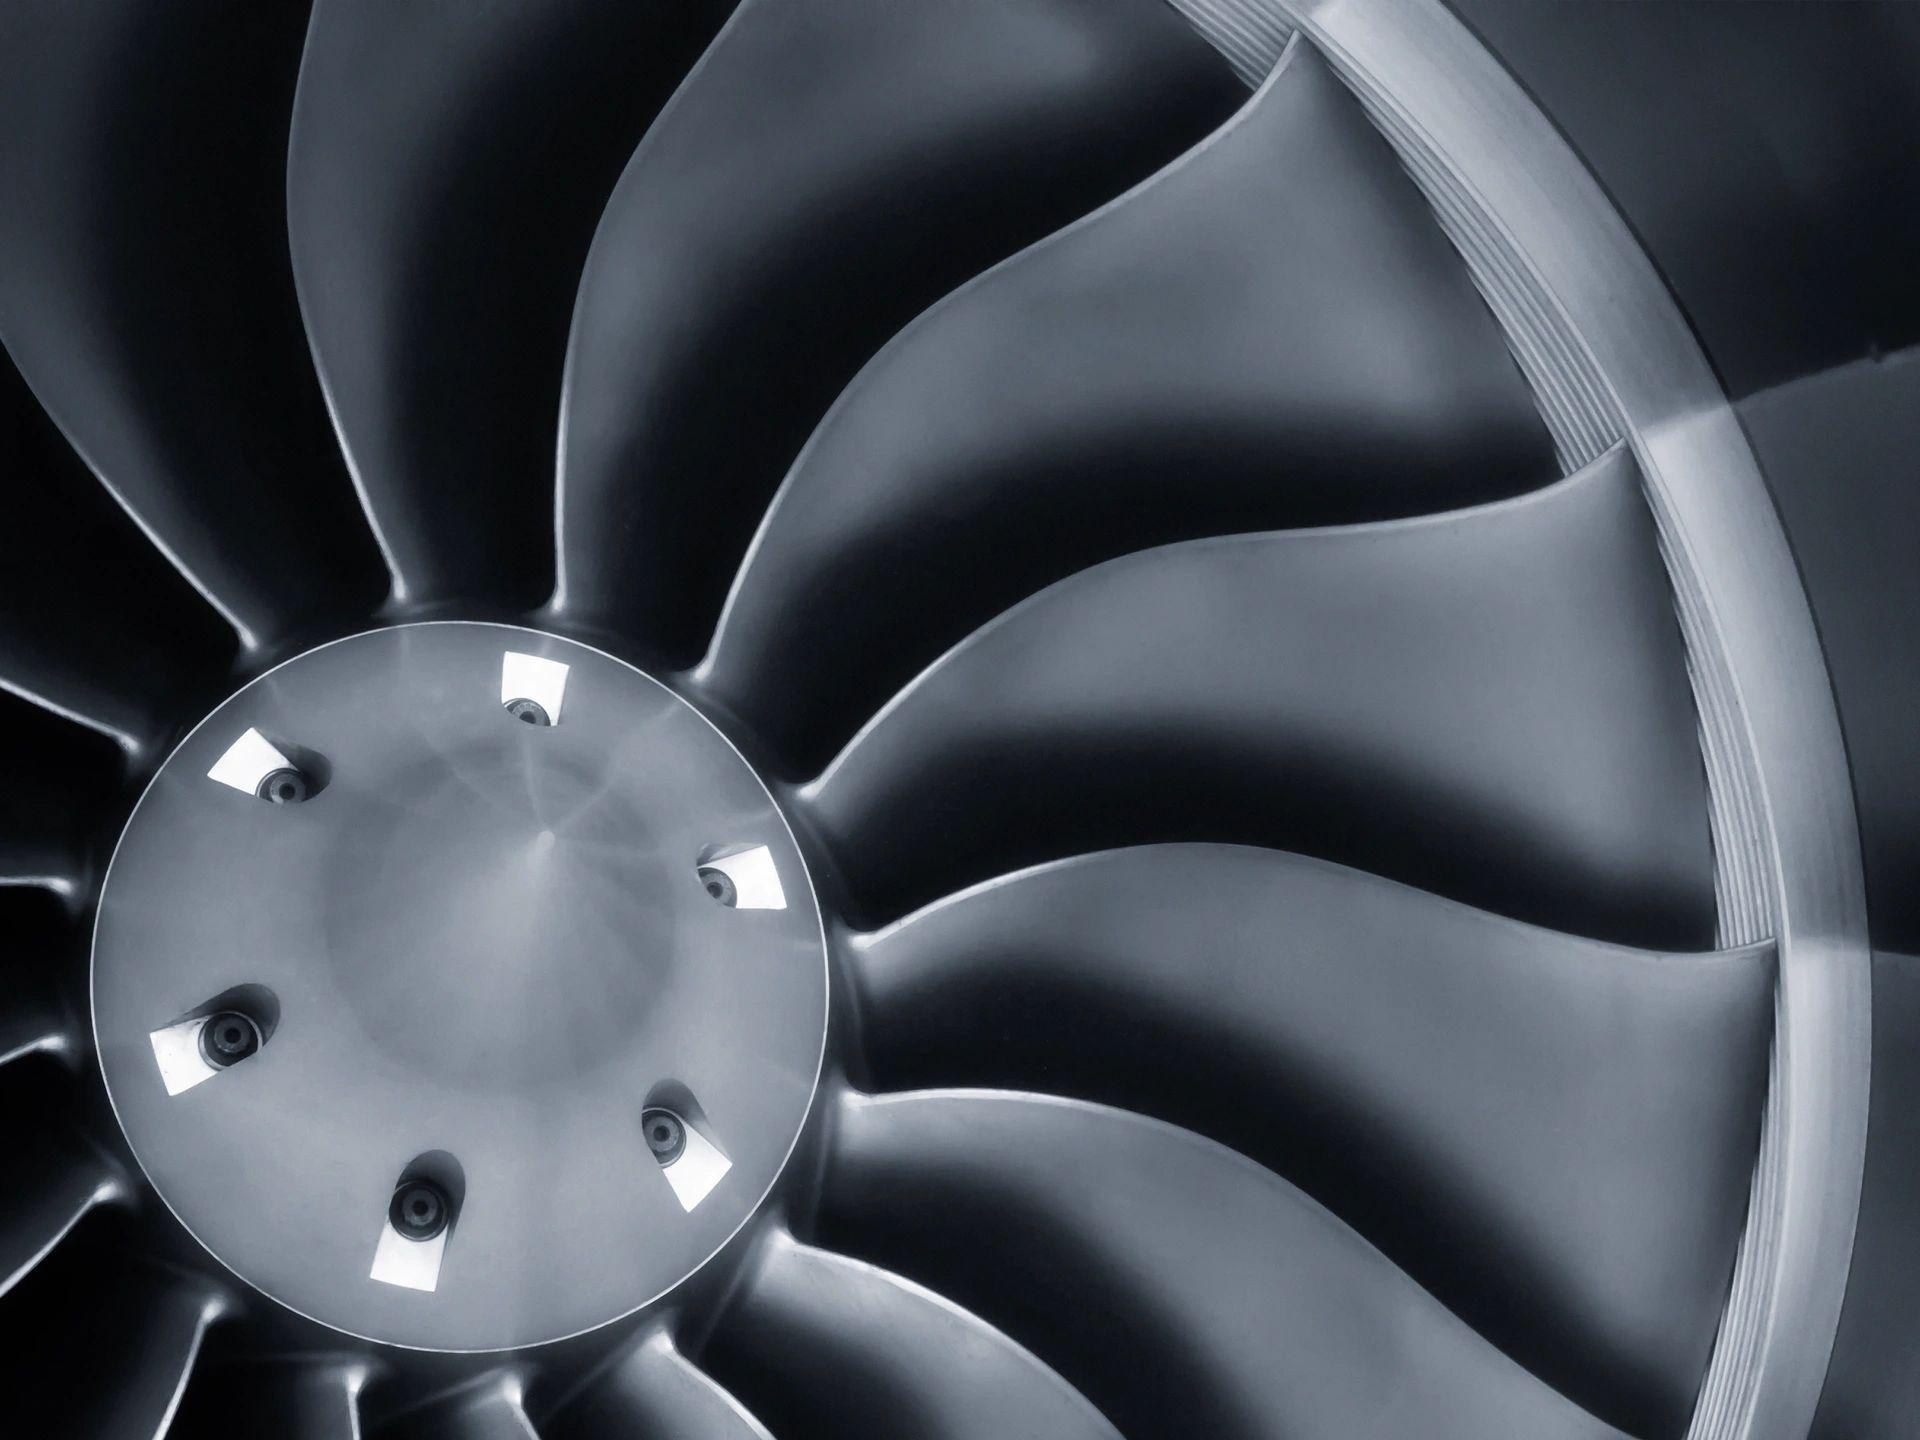 Engine Management Consulting